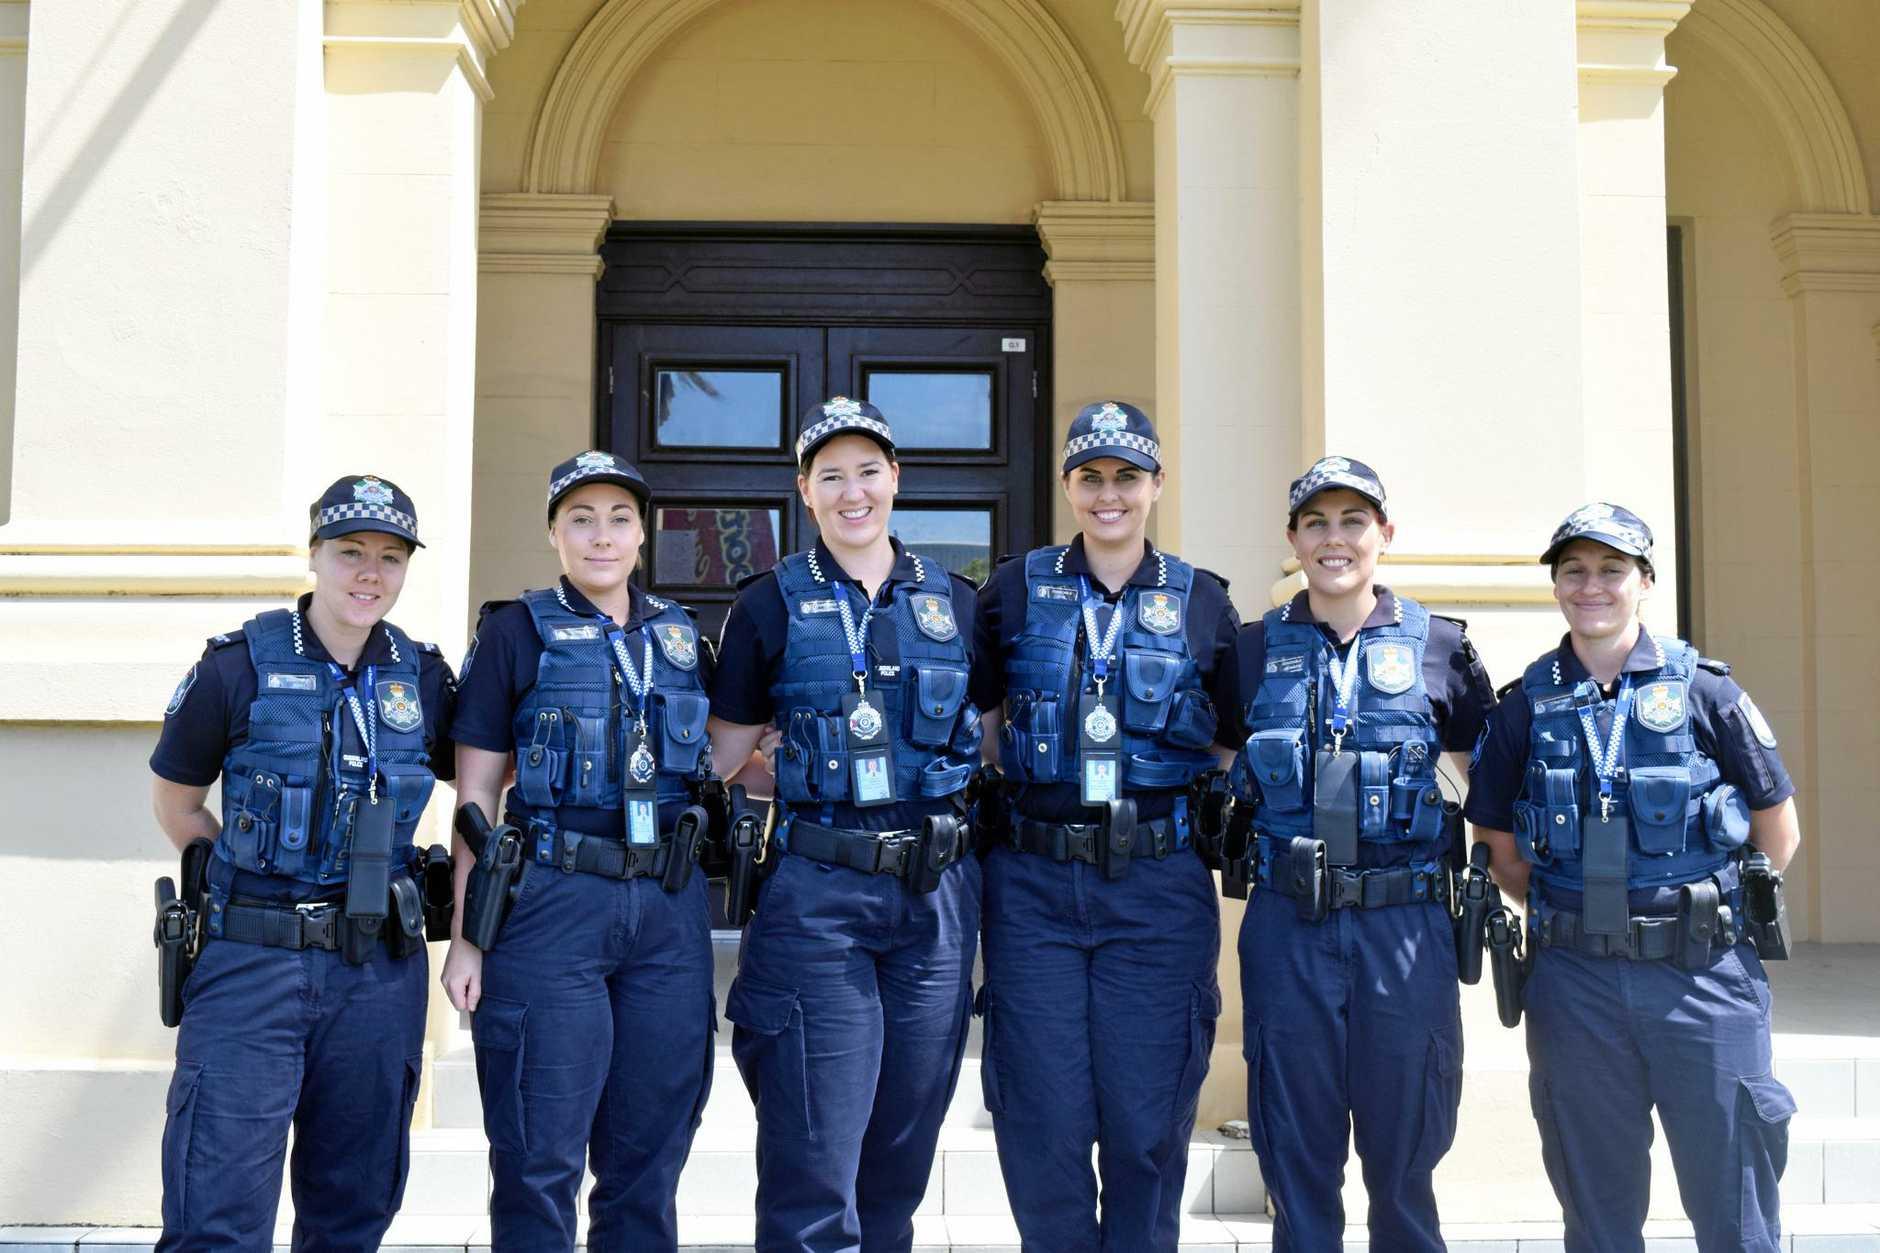 GO GIRLS: Constables Jess Neil, Holly Williams, Lauren Morgan, Adrienne Oliver, Jax Martin and Tegan Jones are Mackay's newest recruits.